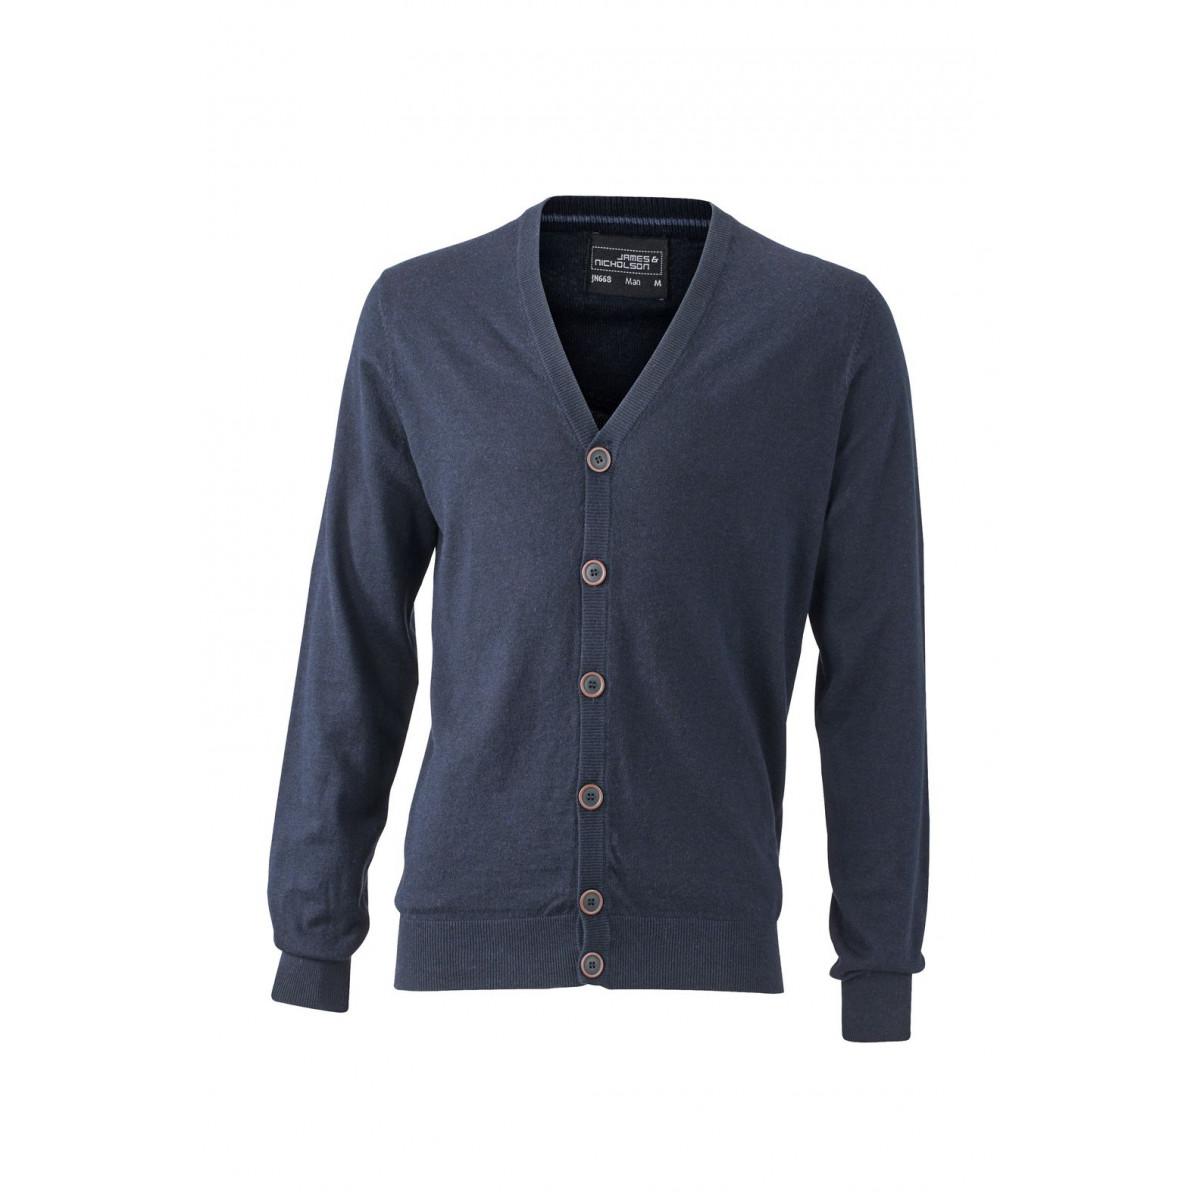 Кардиган мужской JN668 Mens Cardigan - Темно-синий меланж